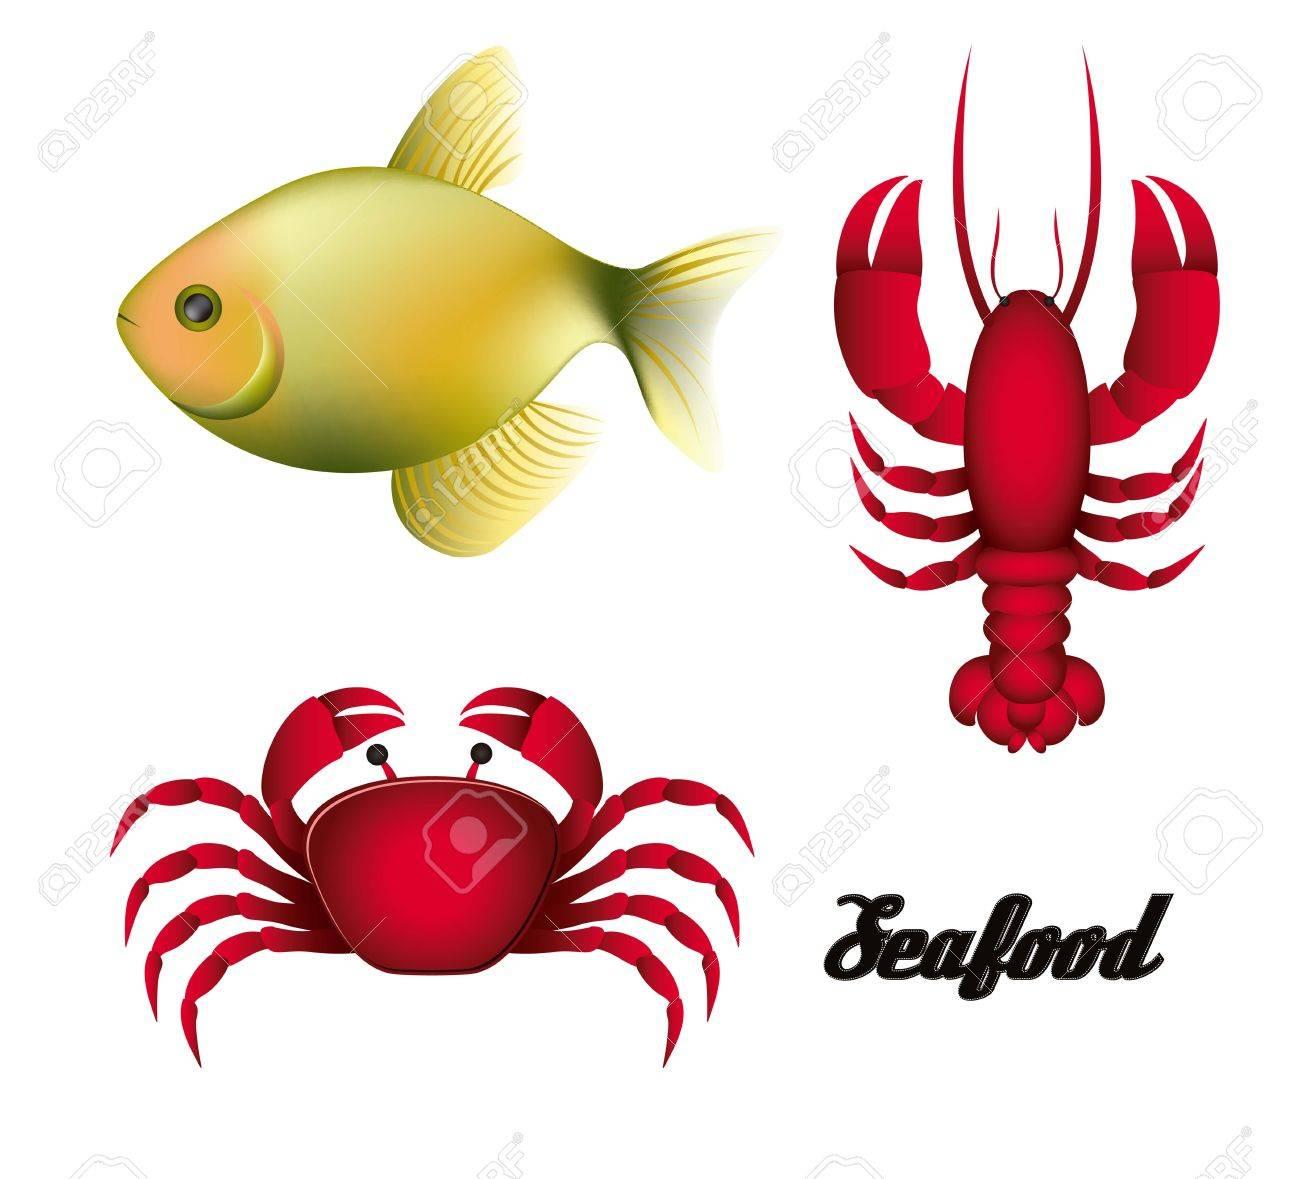 Lobster fishing illustration of sea animals fish crab and lobster illustration